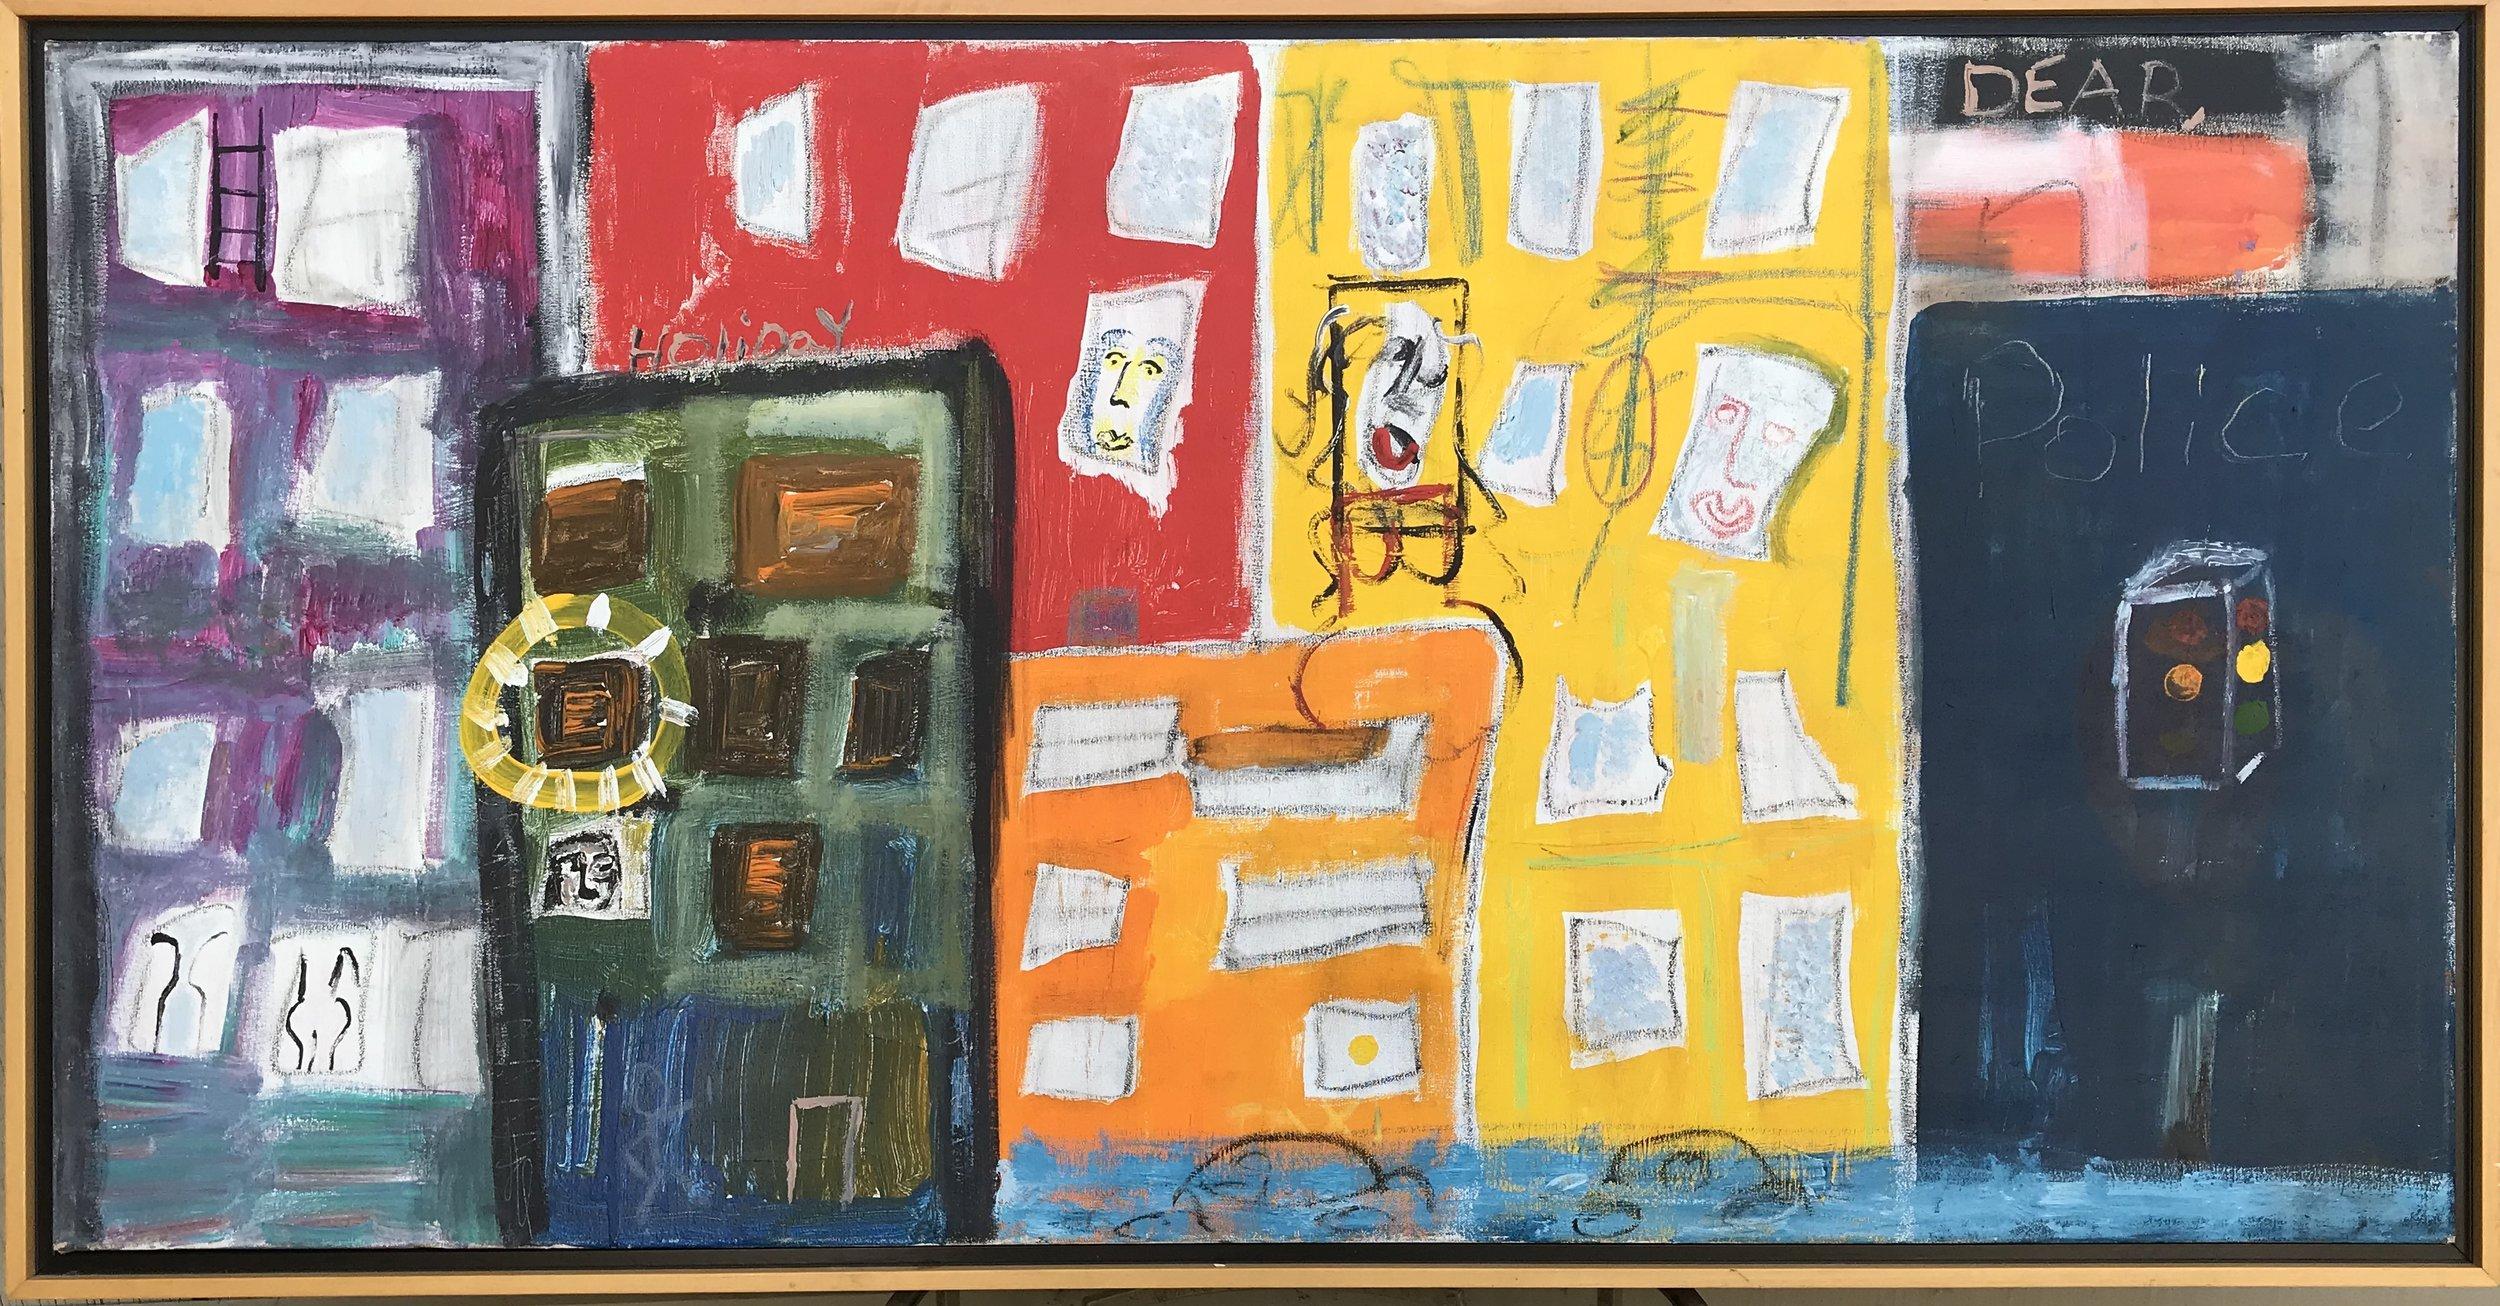 """Dear Police"" - 24"" x 48"" in 2"" deep floater frameValue: $4,700Opening bid: $1,850email your bid to: art@bradfordbrenner.com"